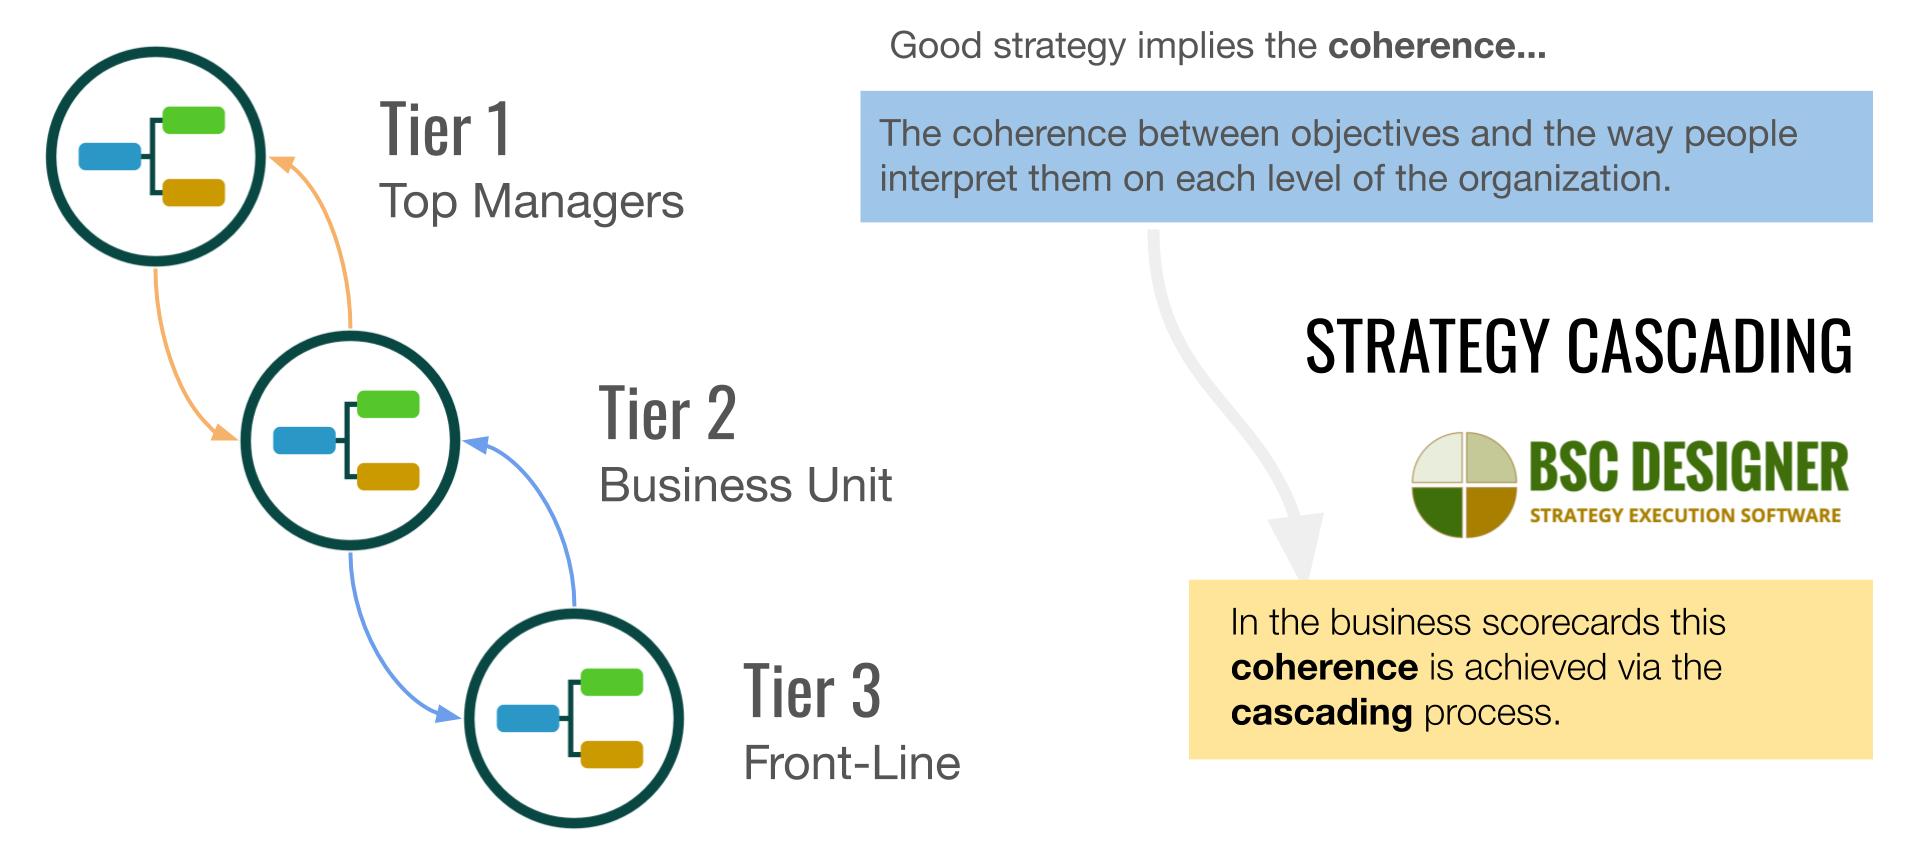 Strategy cascading